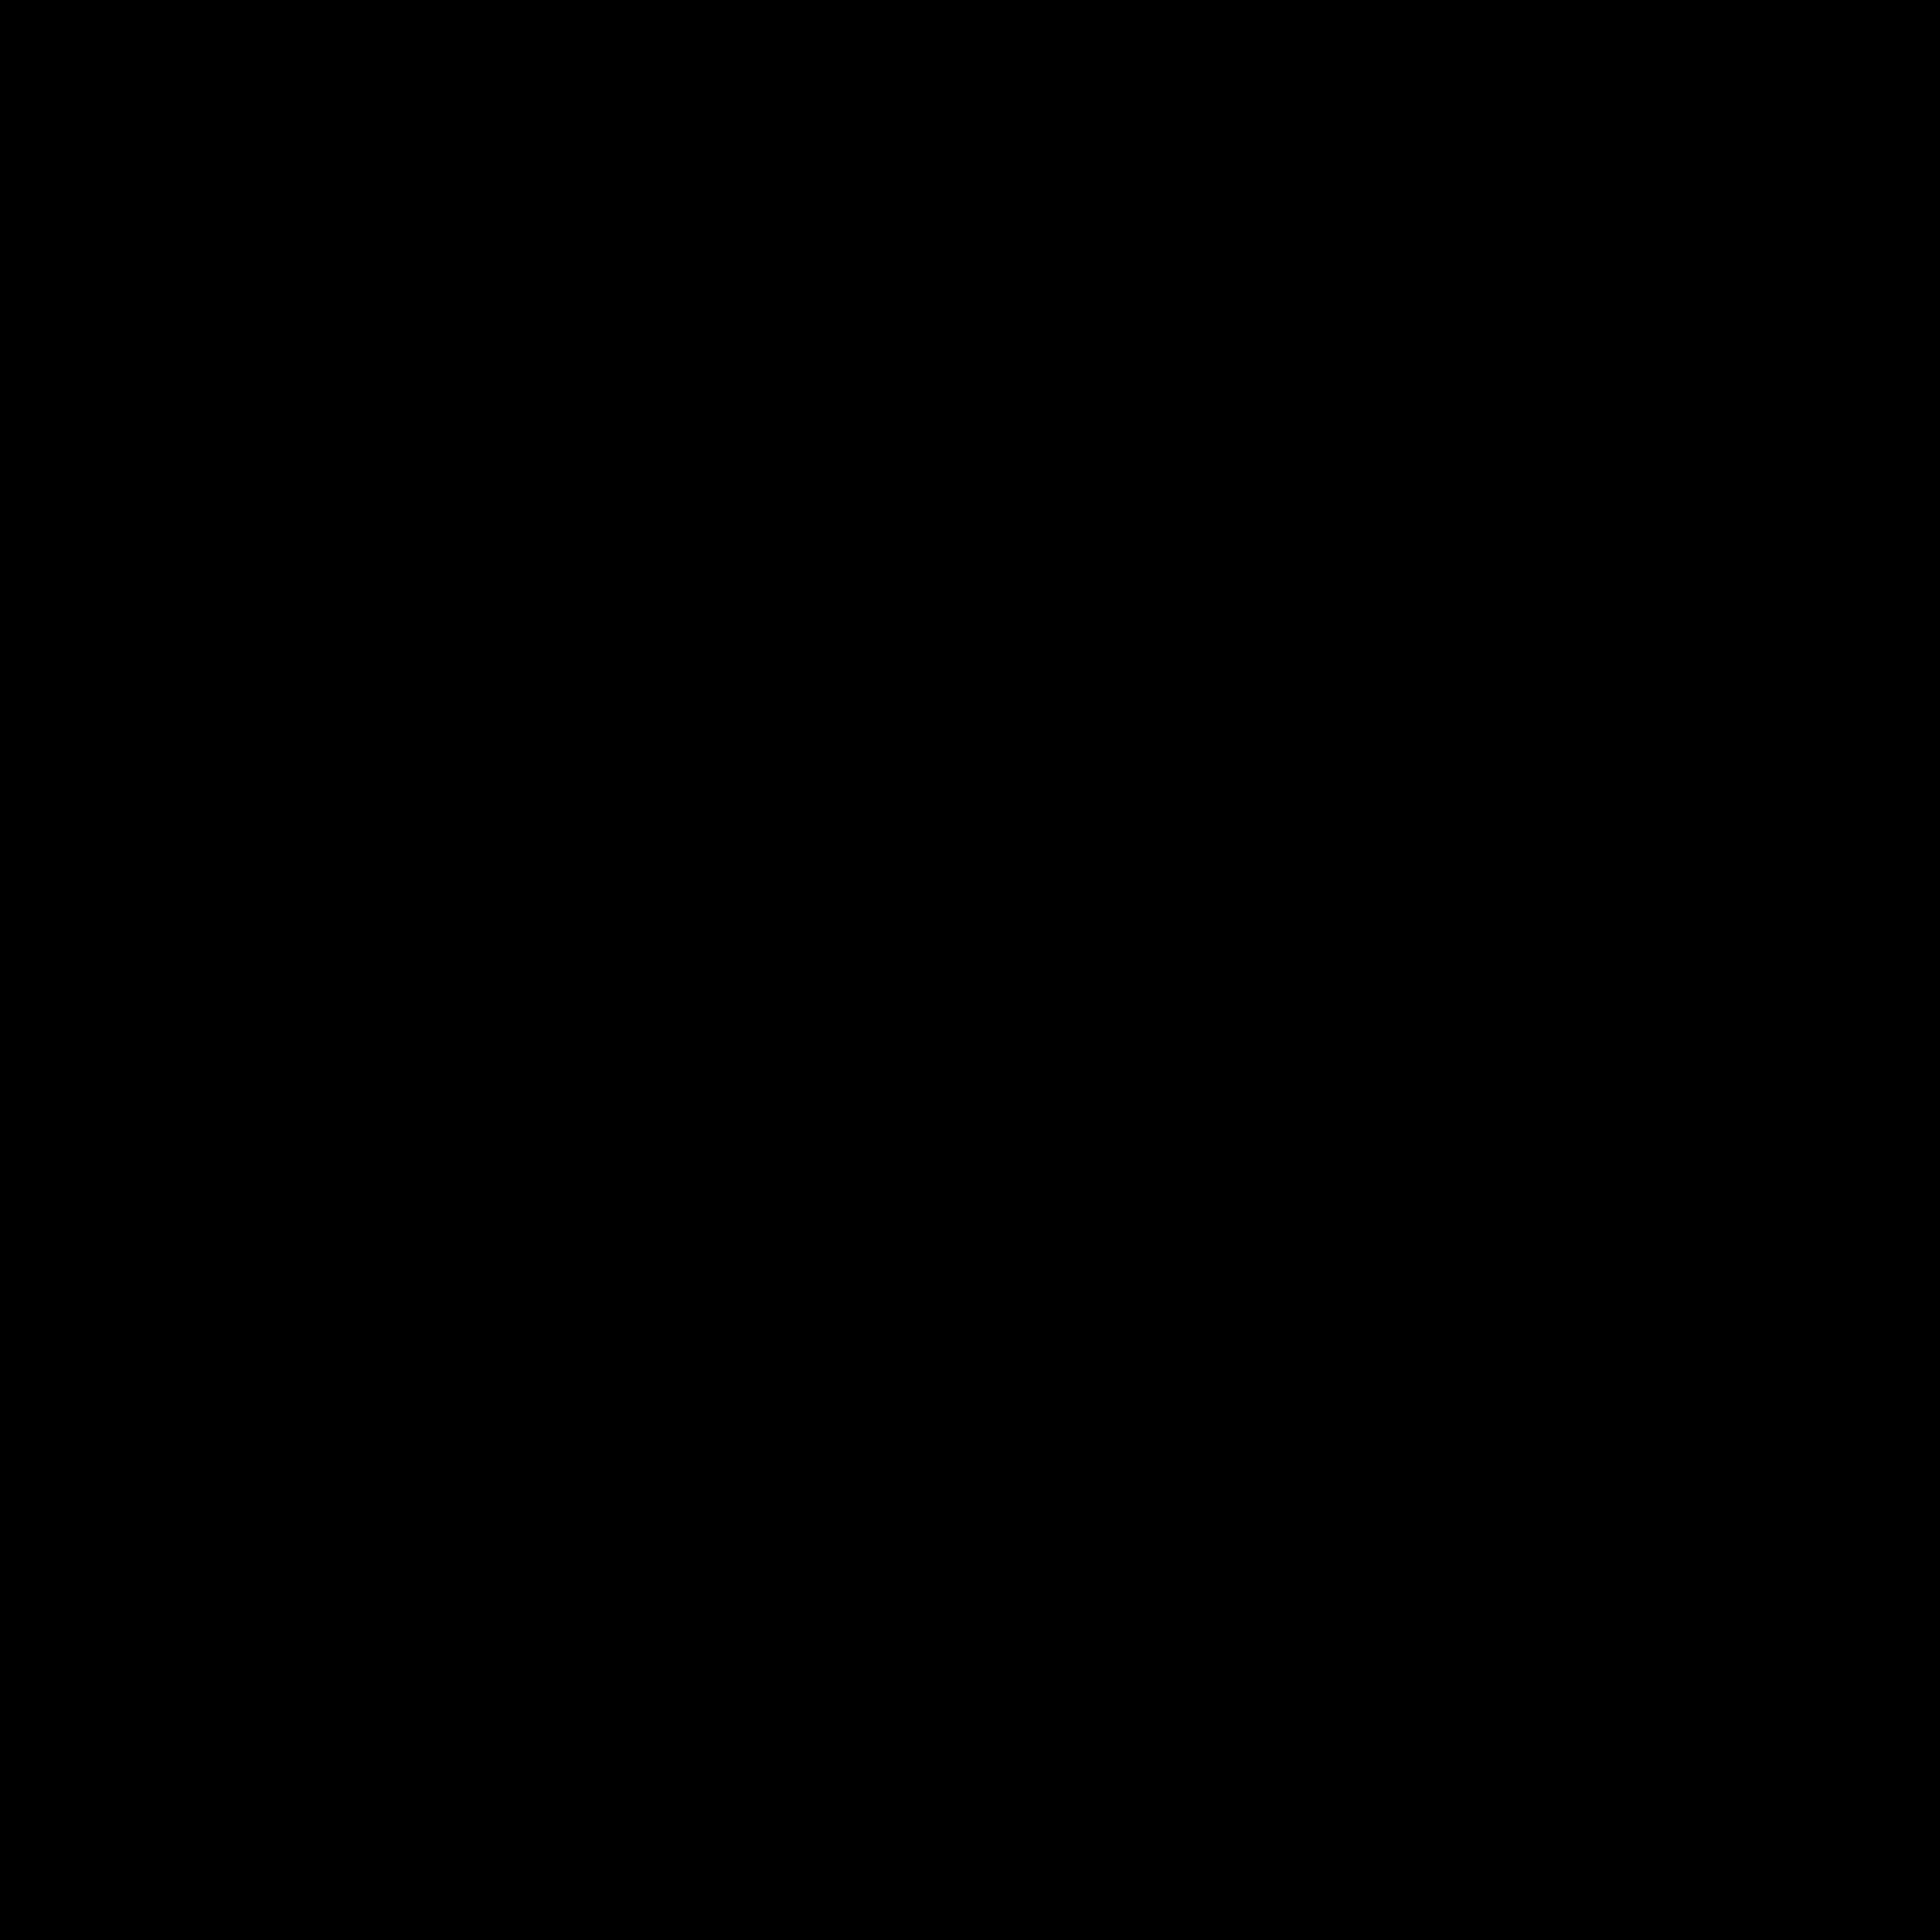 Bandai 01 Logo PNG Transparent & SVG Vector.